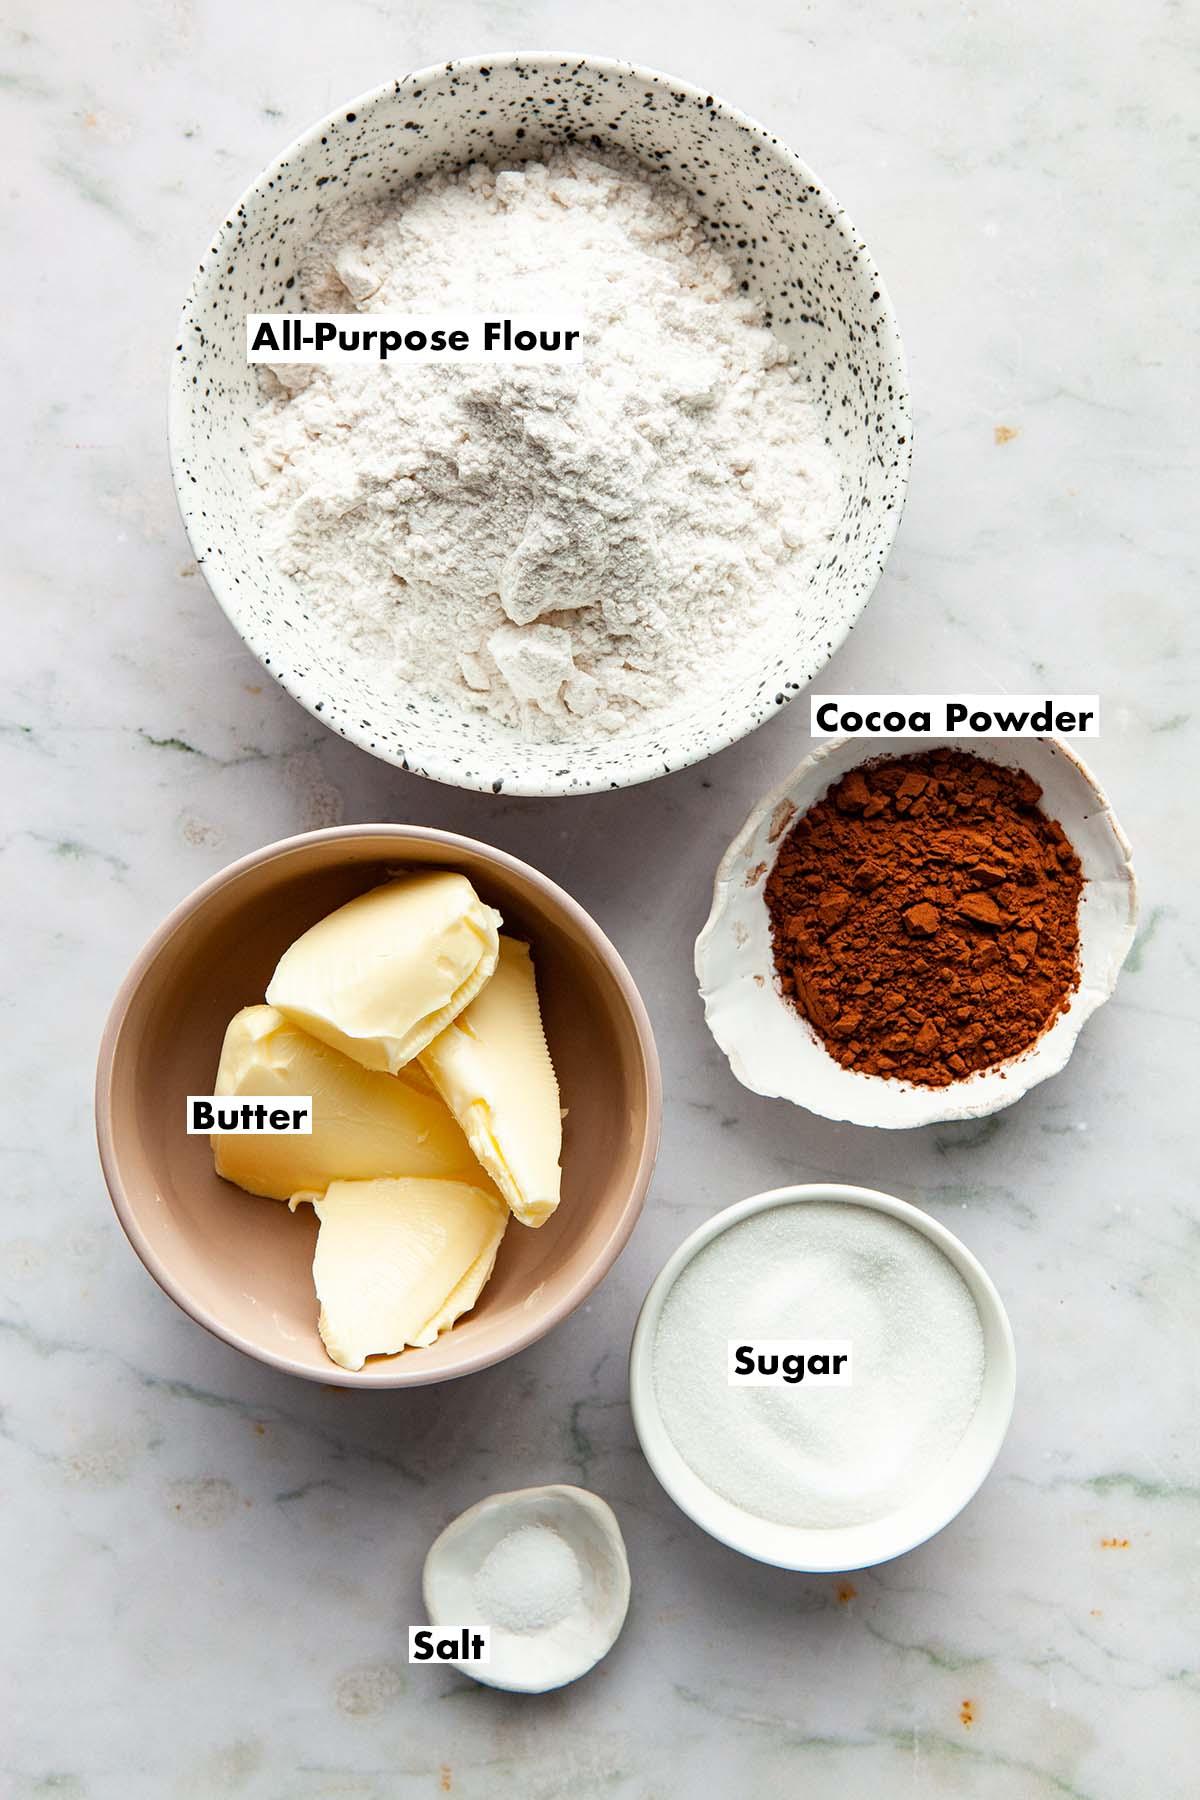 Ingredients to make chocolate shortbread sandwich cookies.